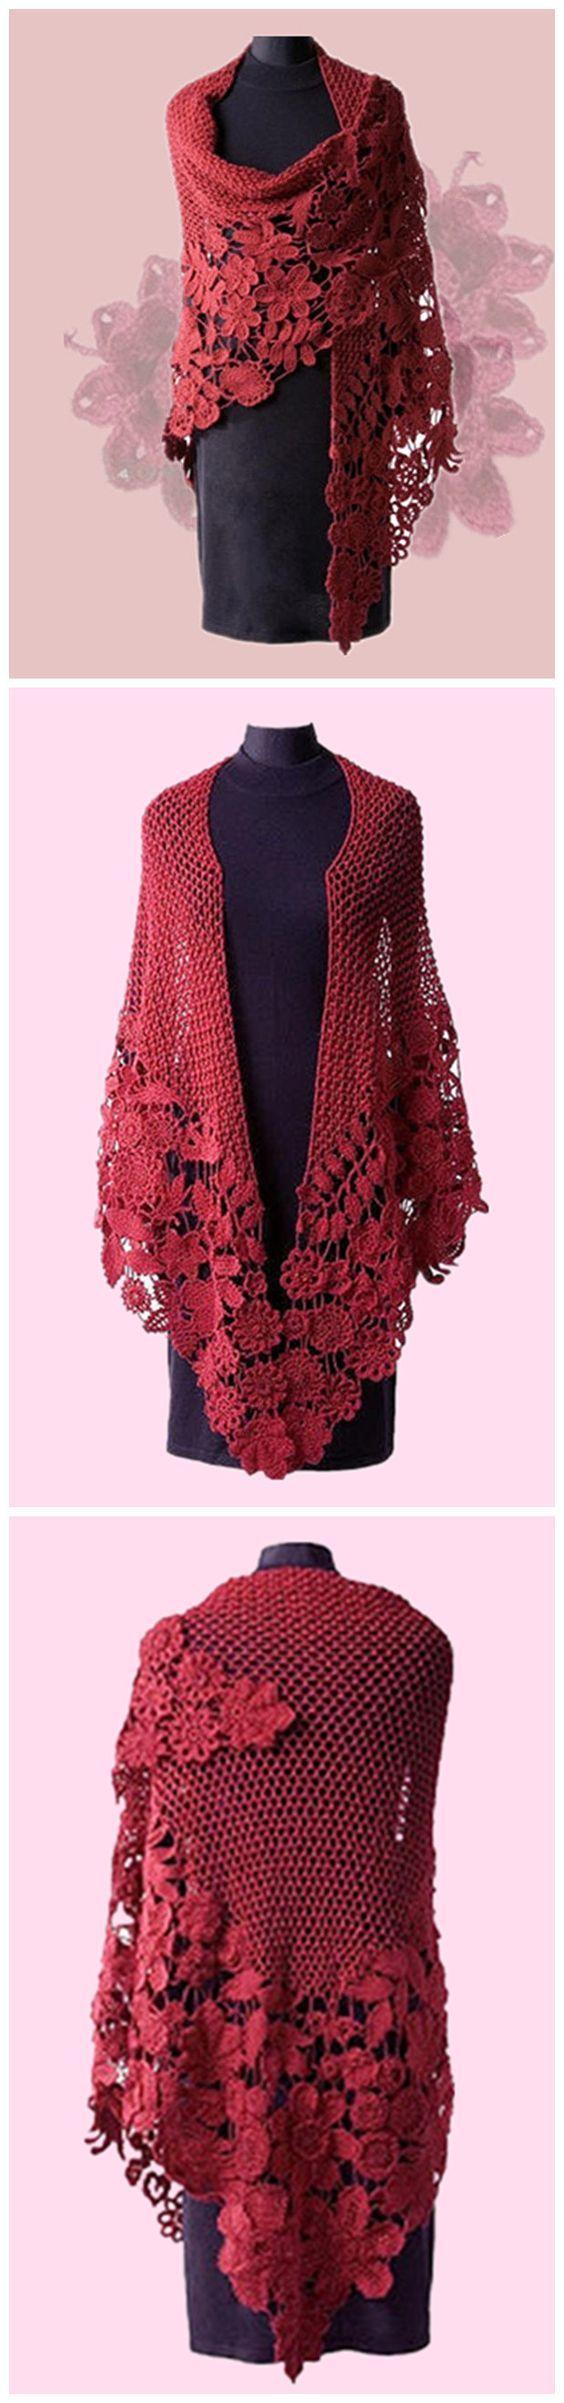 Elegant long crocheted shawl.